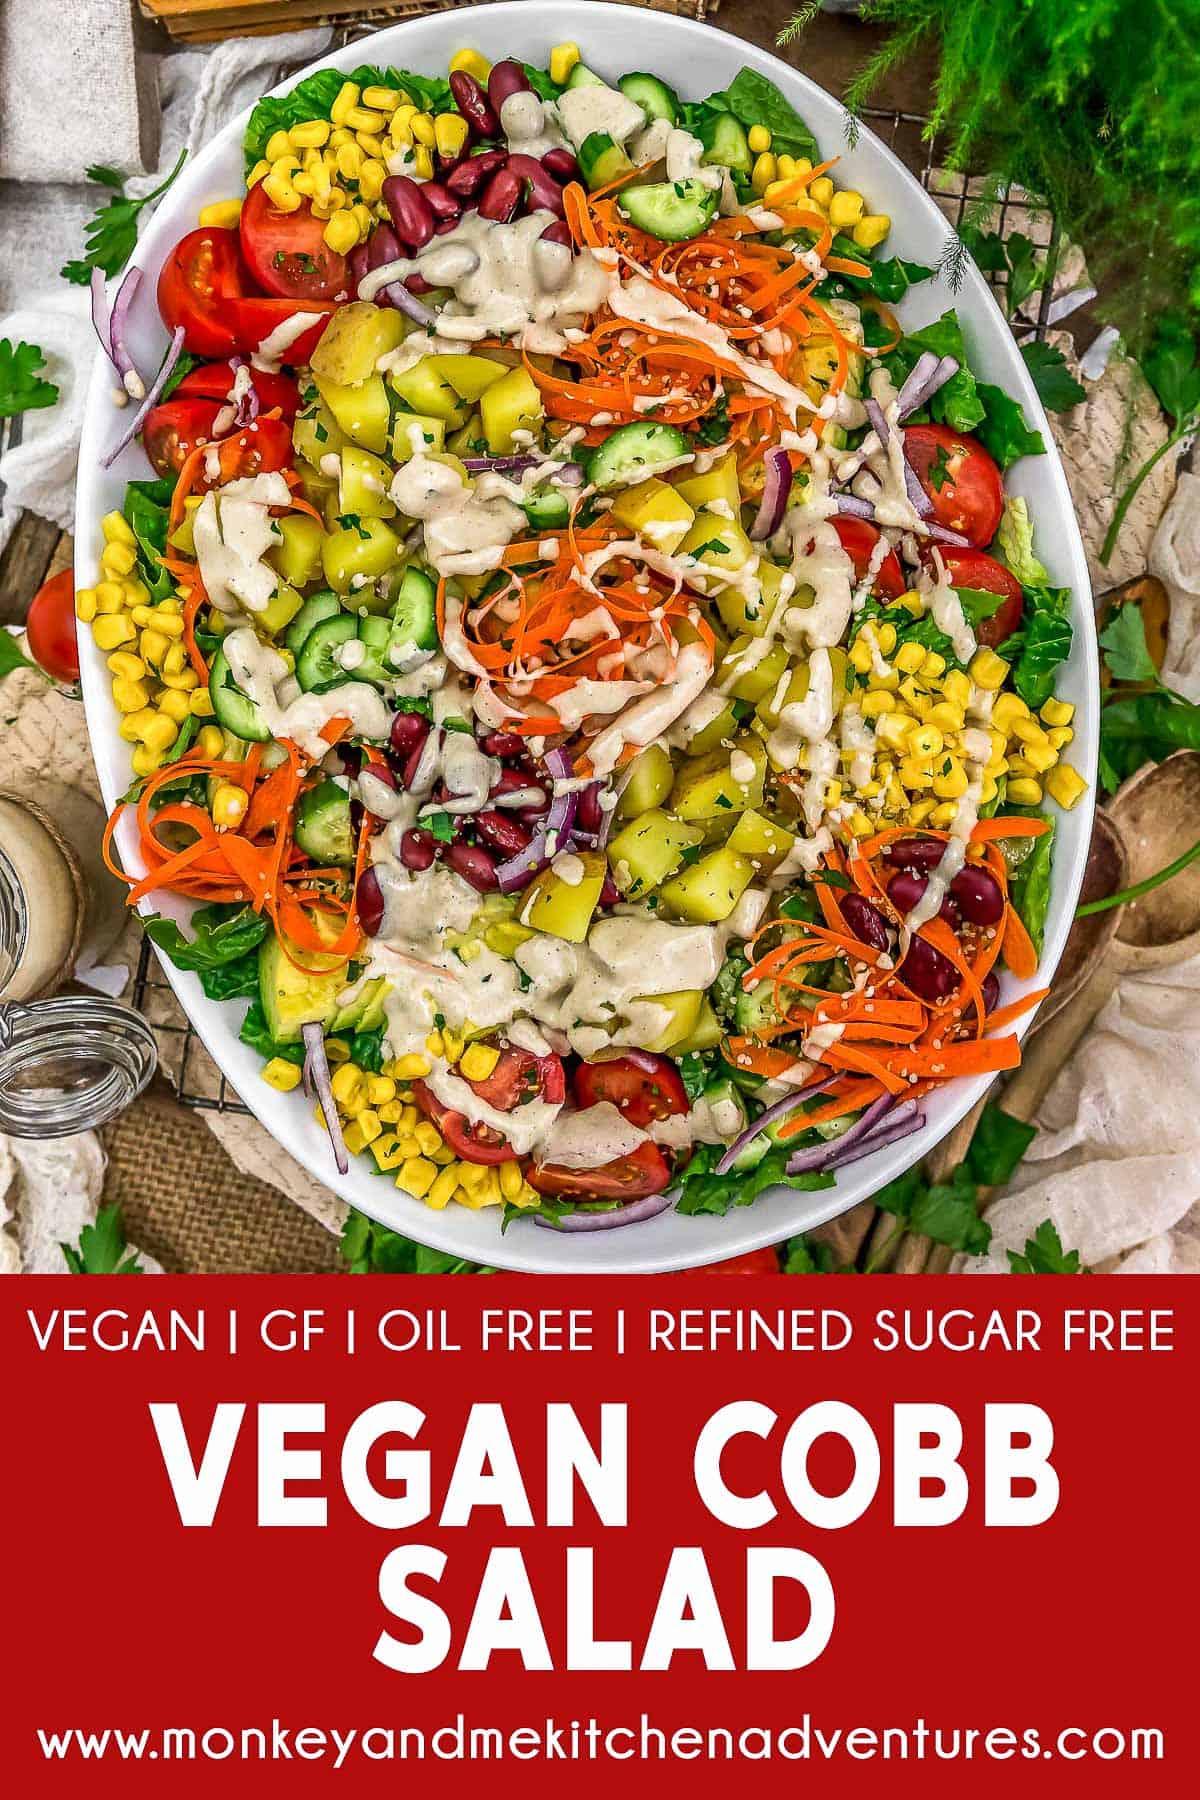 Vegan Cobb Salad with text description